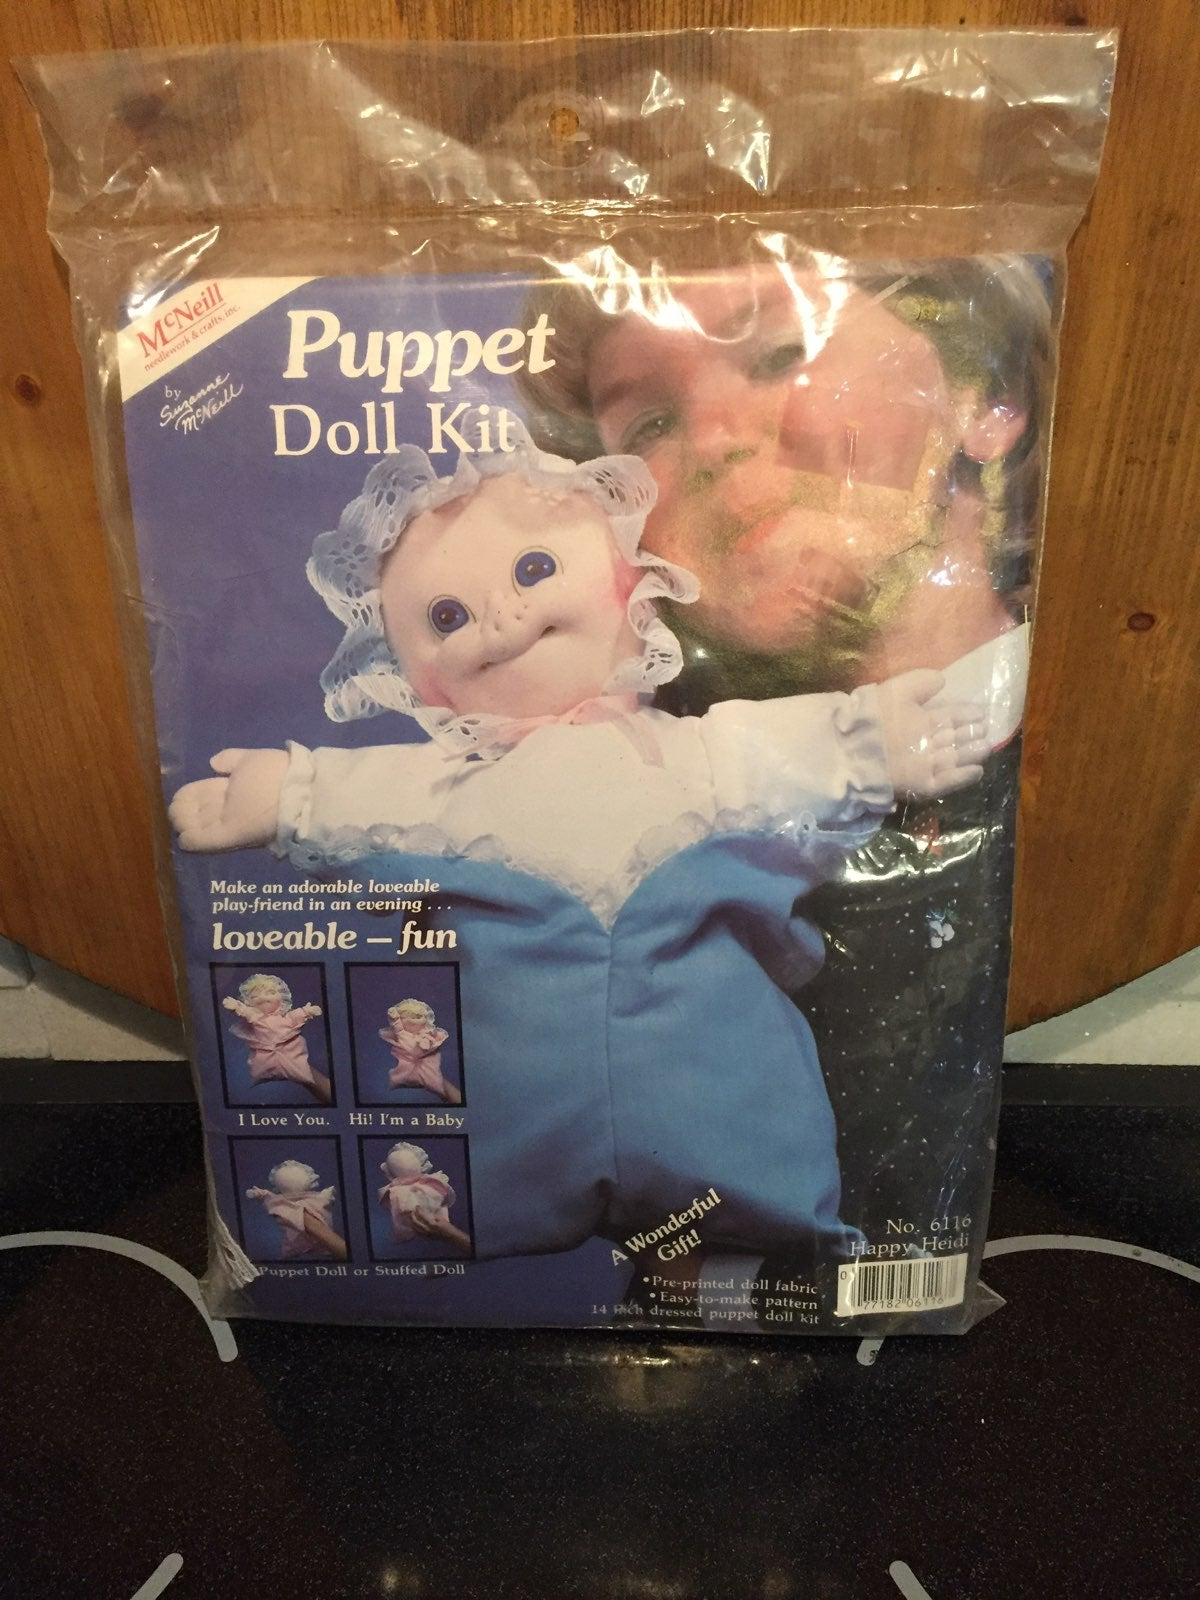 Puppet Doll Kit Happy Heidi